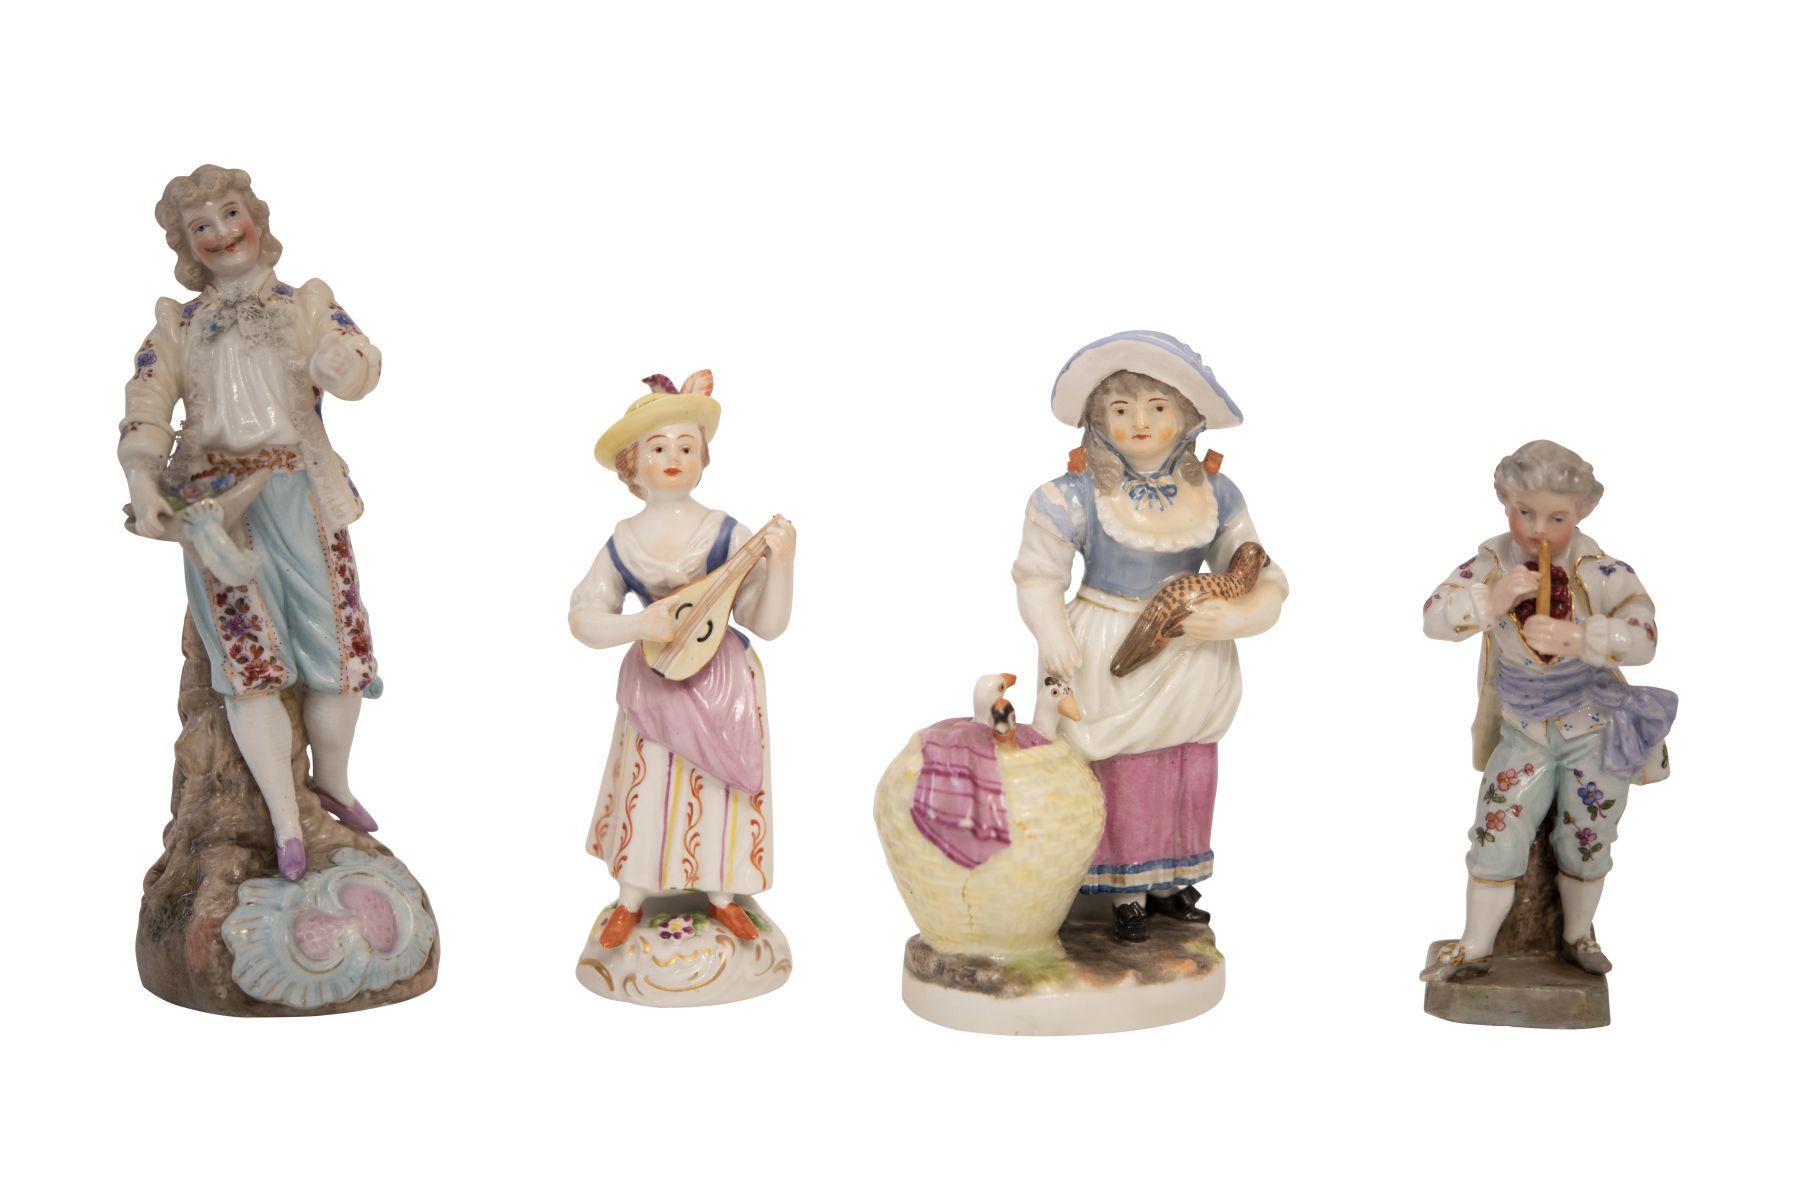 #167 Convolute porcelain figures | Konvolut Porzellanfiguren Image